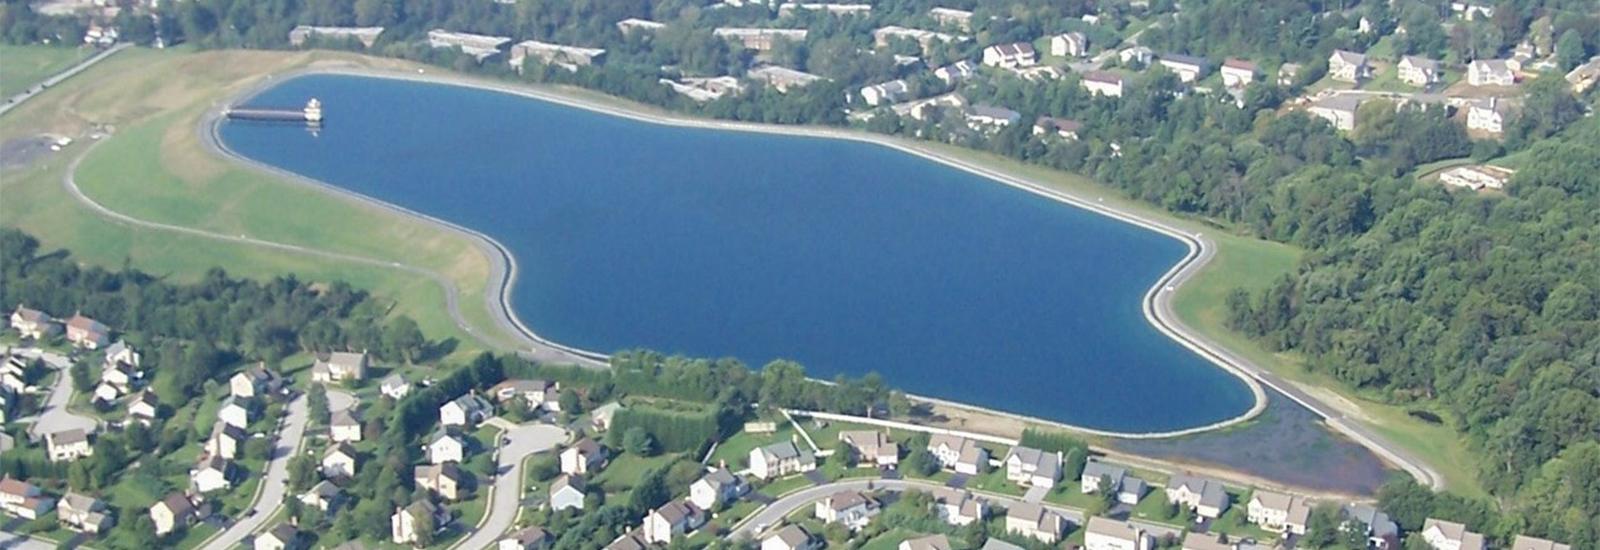 Newark Reservoir